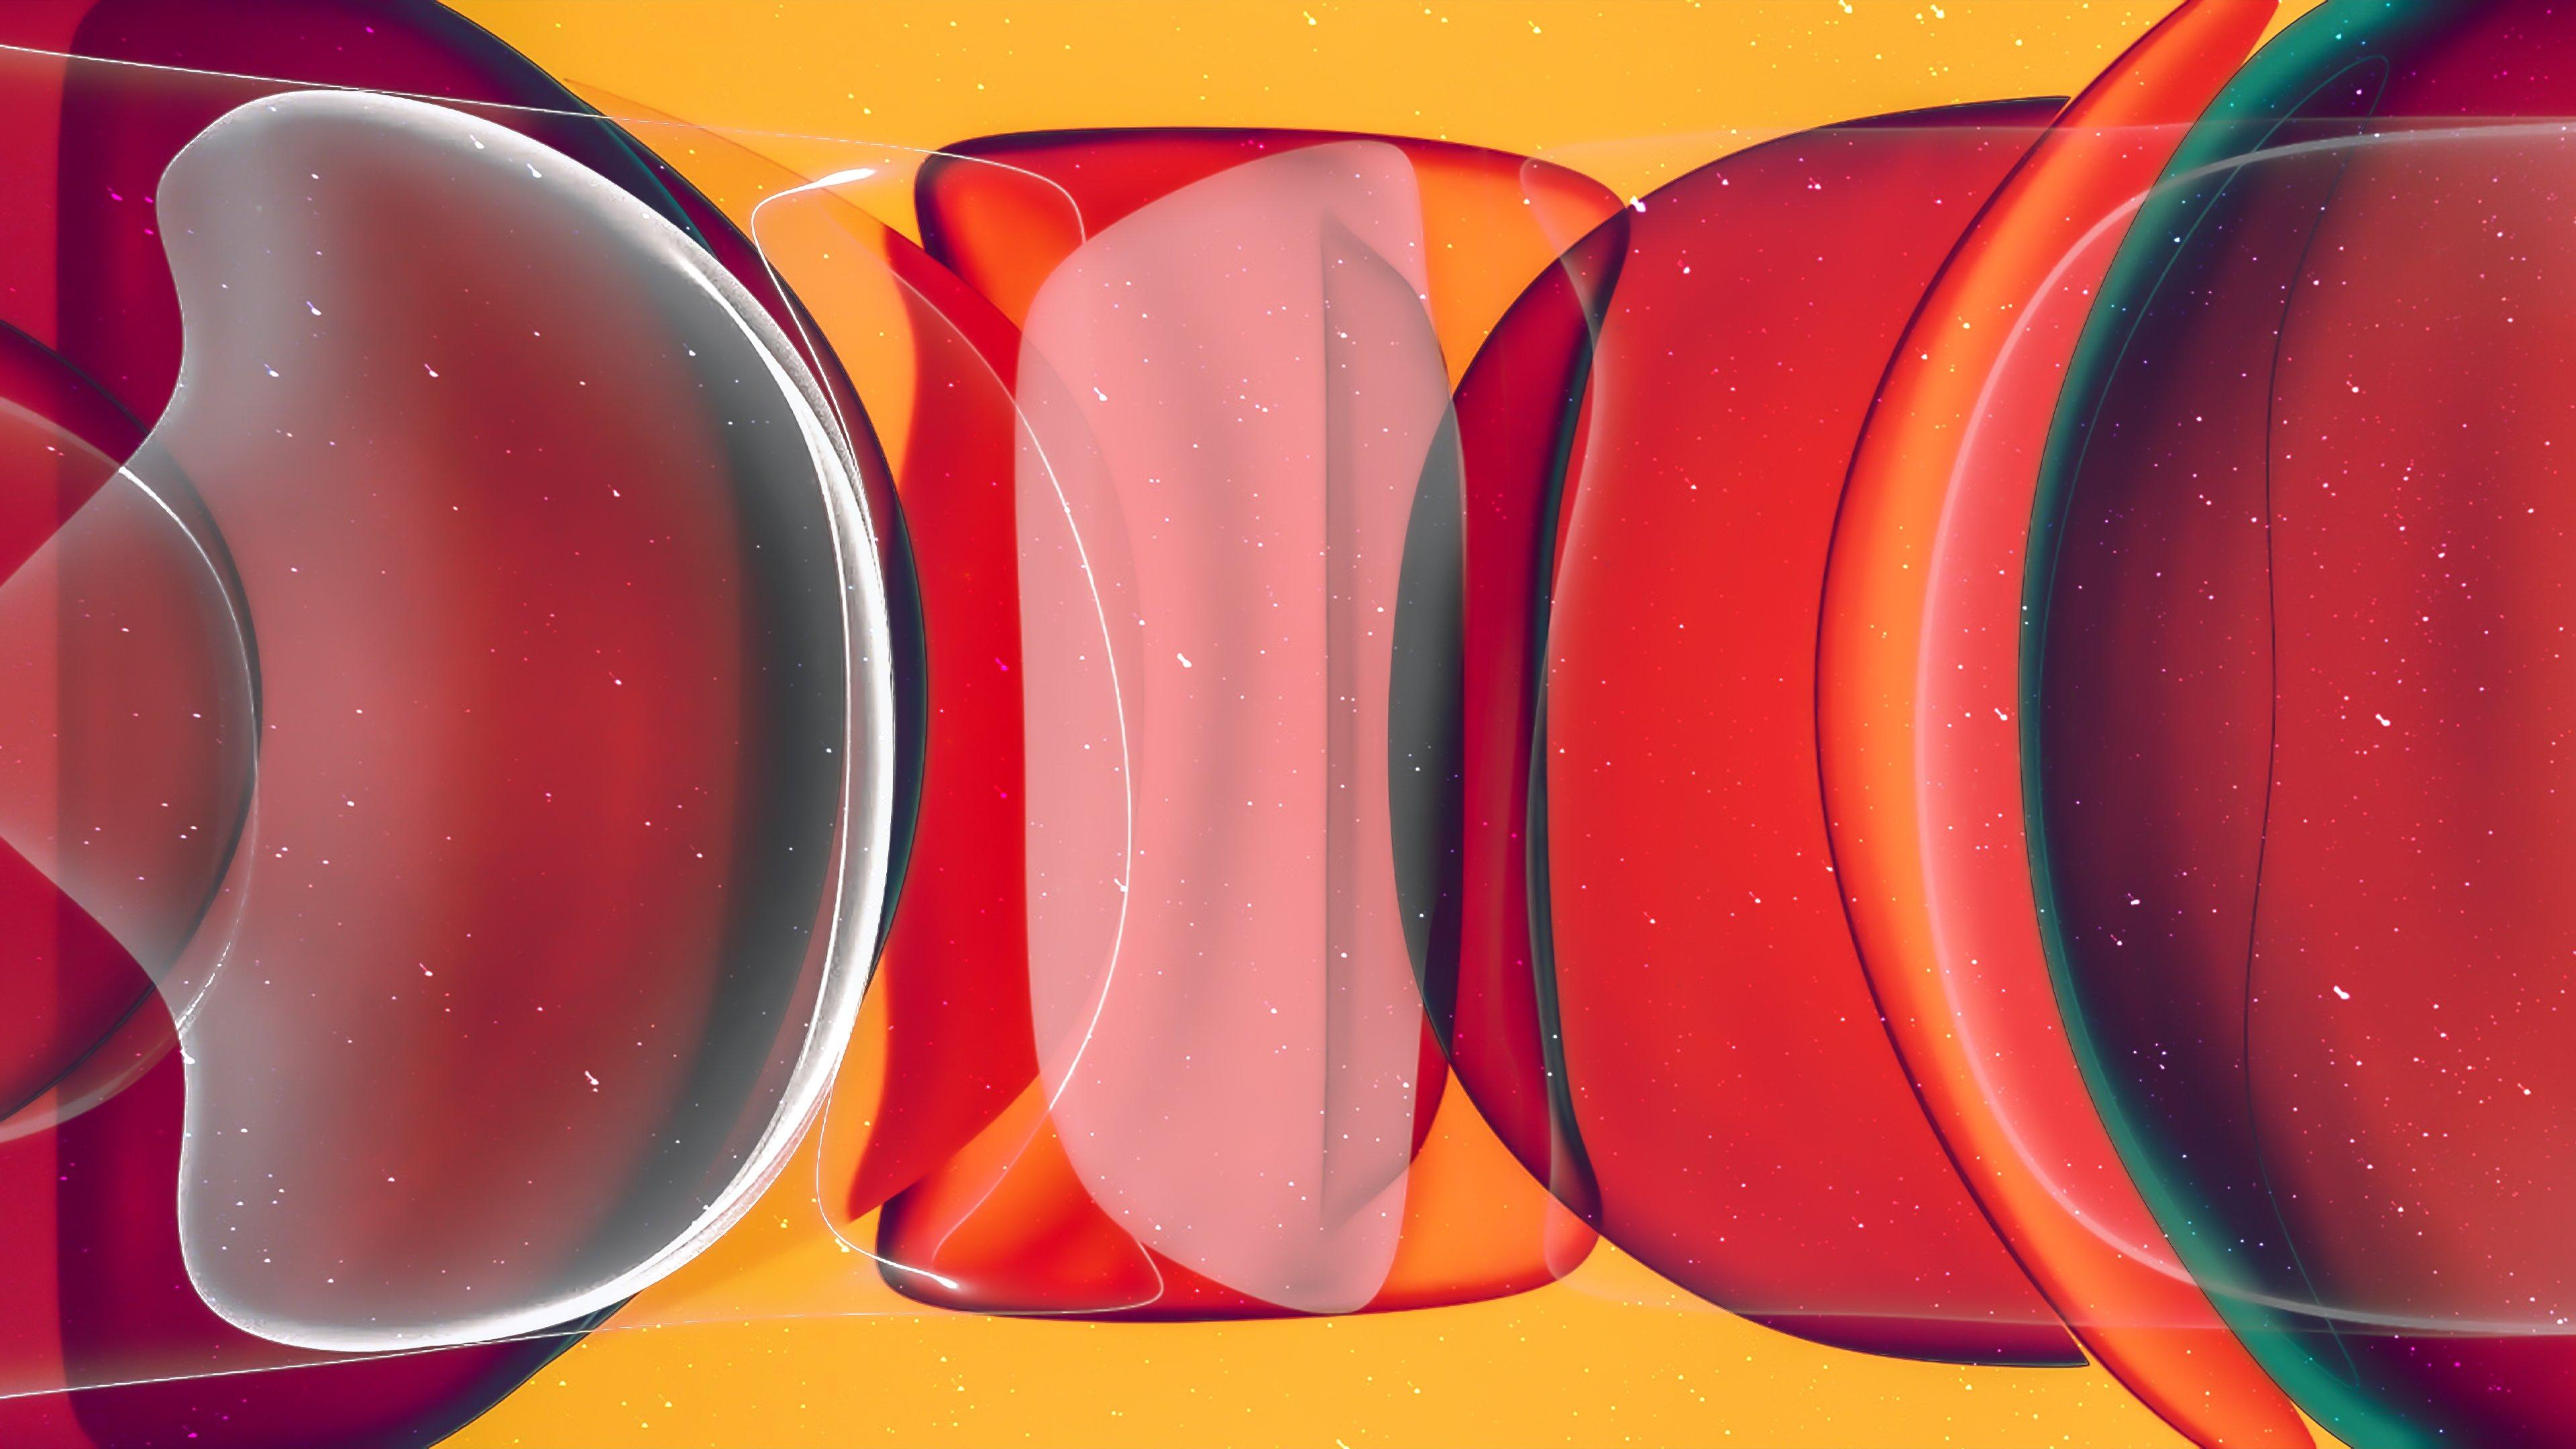 Fondos de pantalla Burbujas rojas abstractas